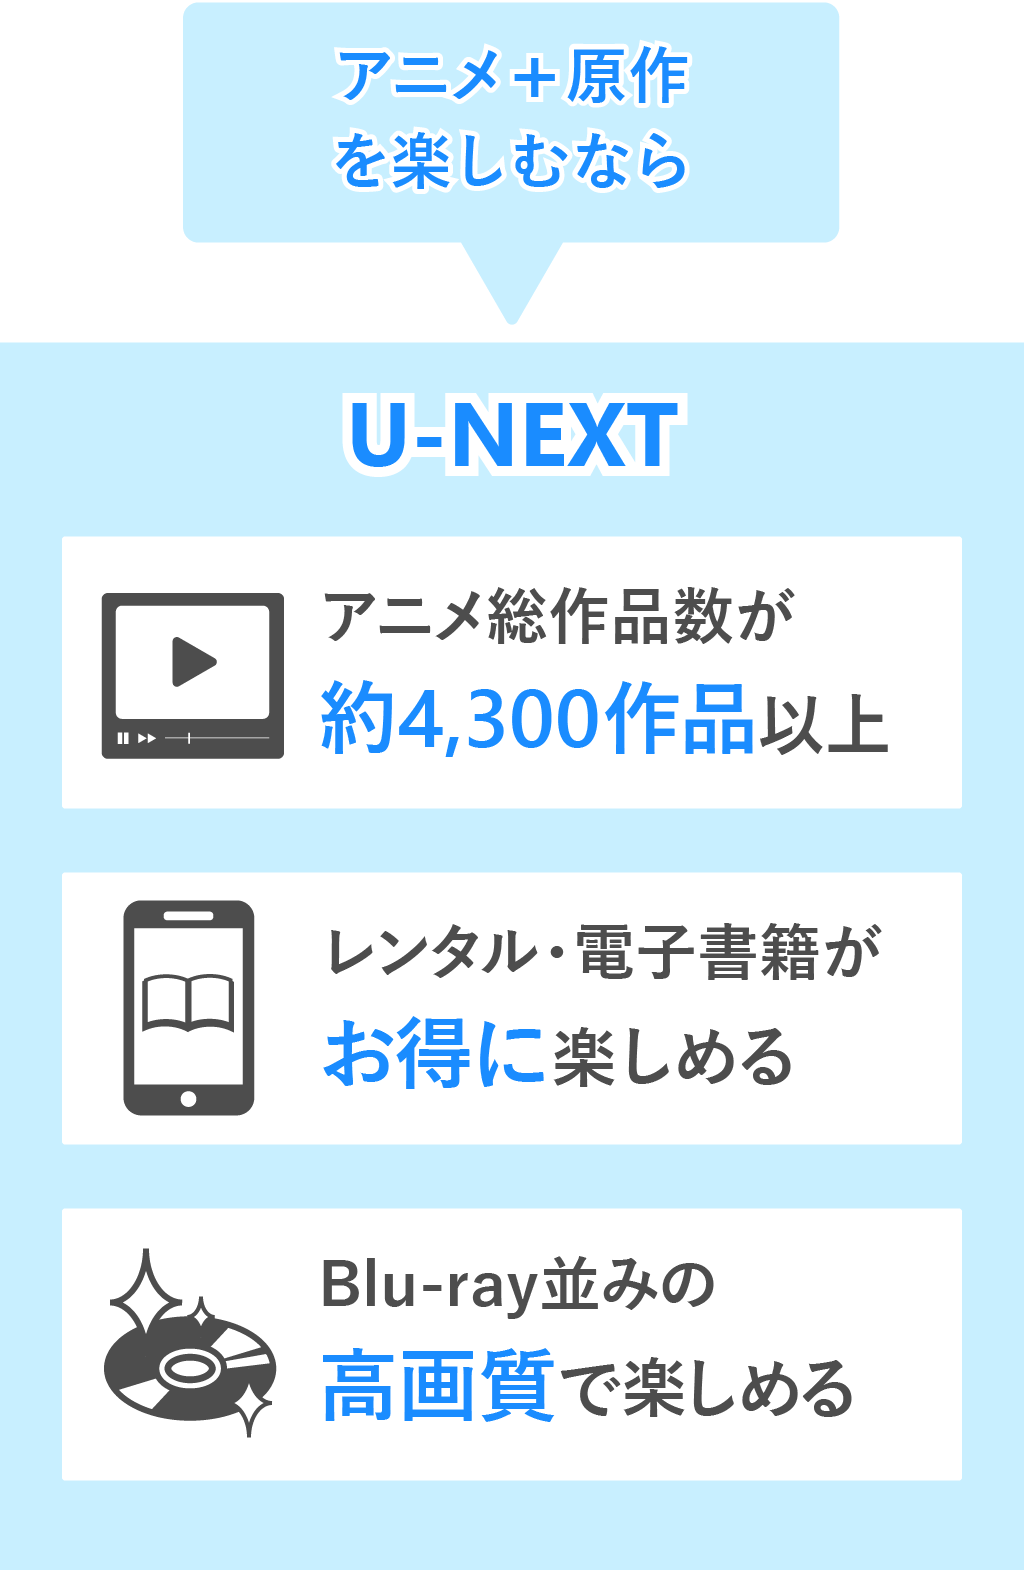 U-NEXTのおすすめポイント